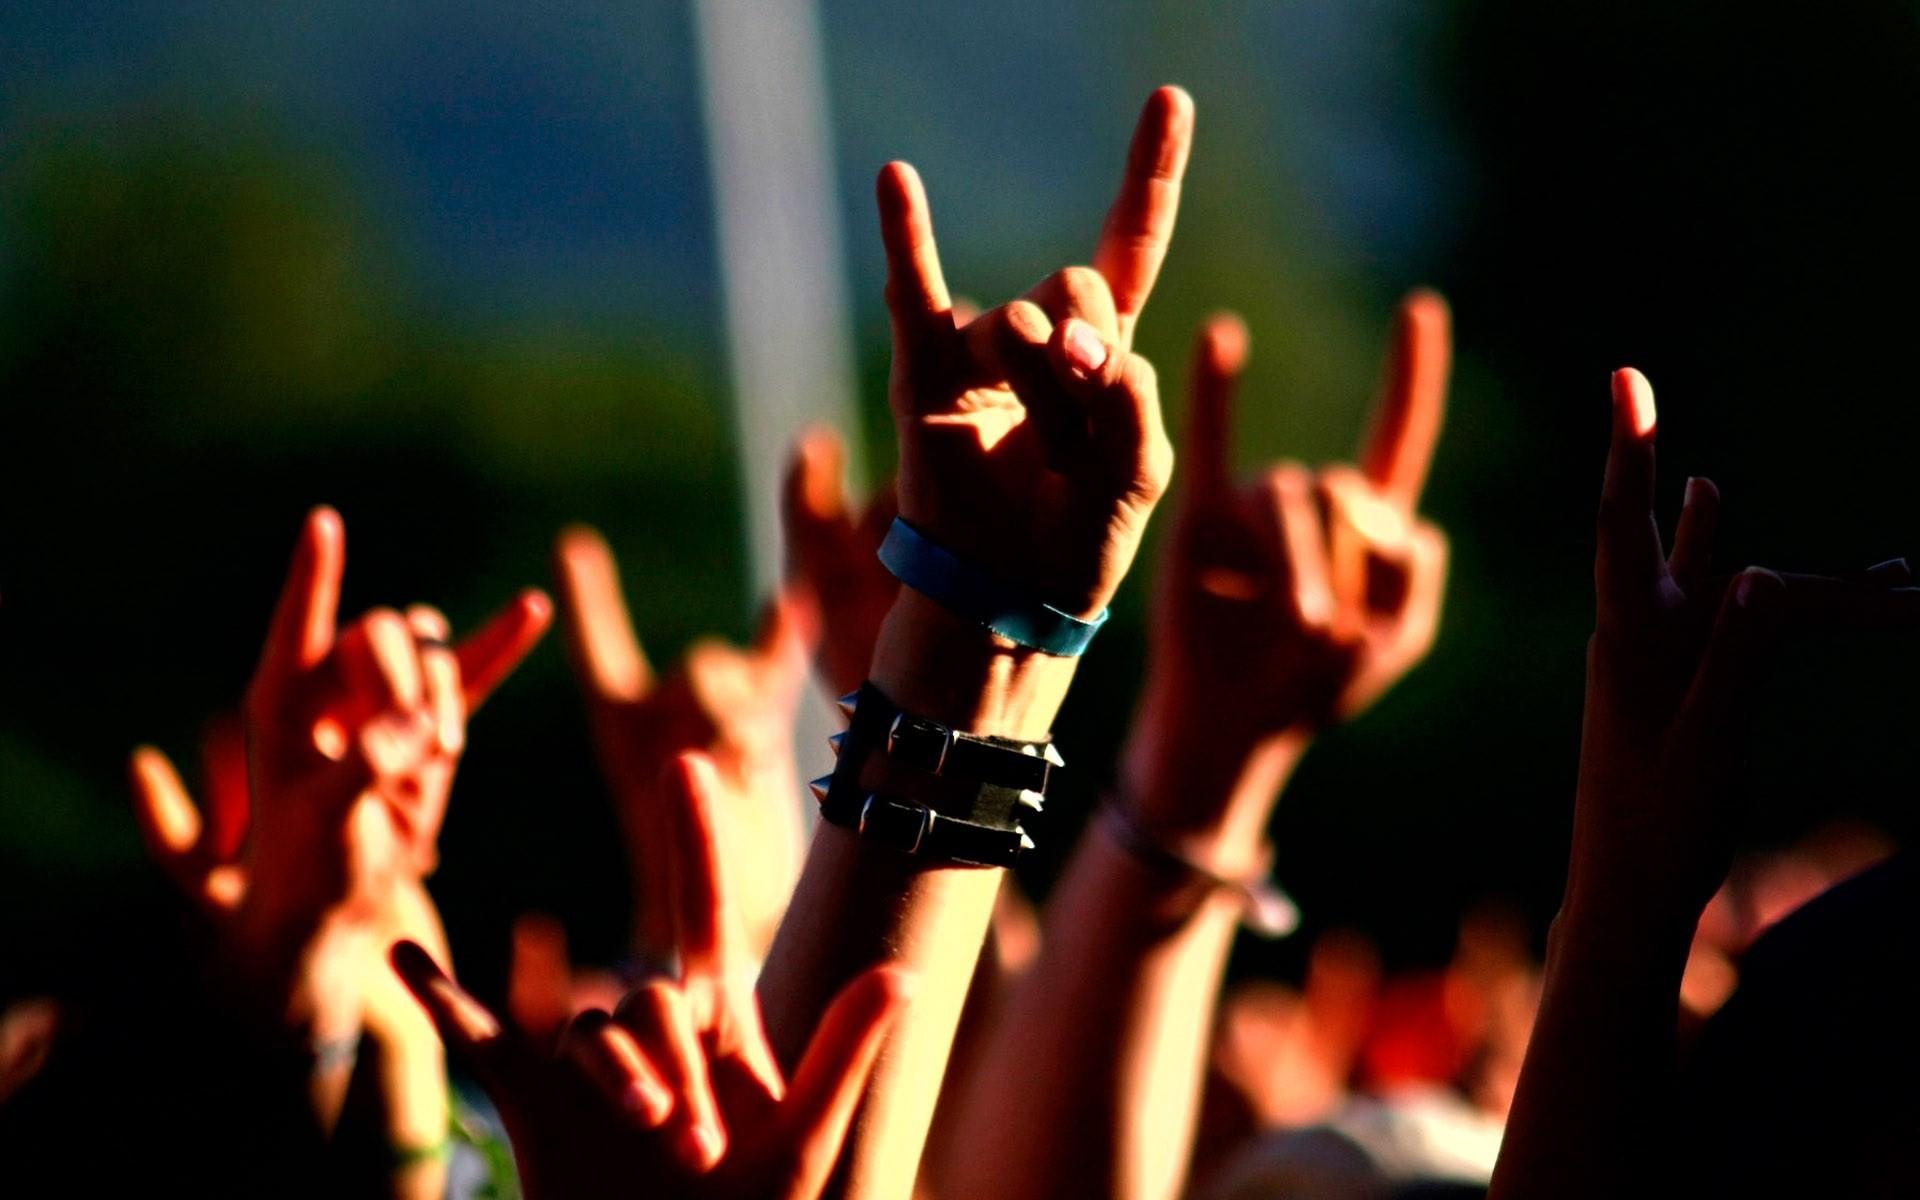 Atento Guillier: Gene Simmons quiere patentar popular gesto rockero